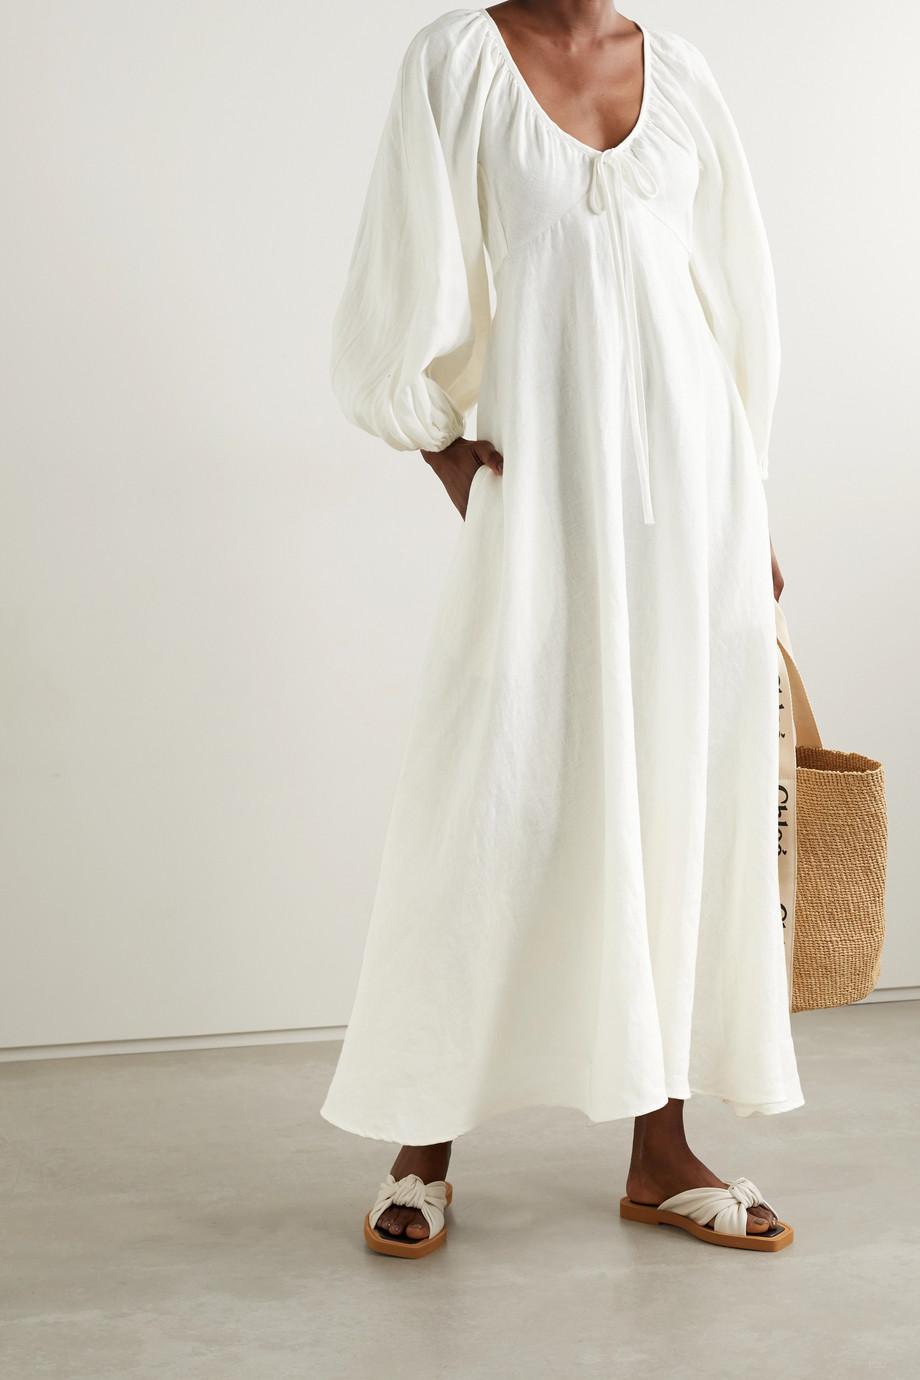 Fil De Vie + NET SUSTAIN Maribelle linen maxi dress